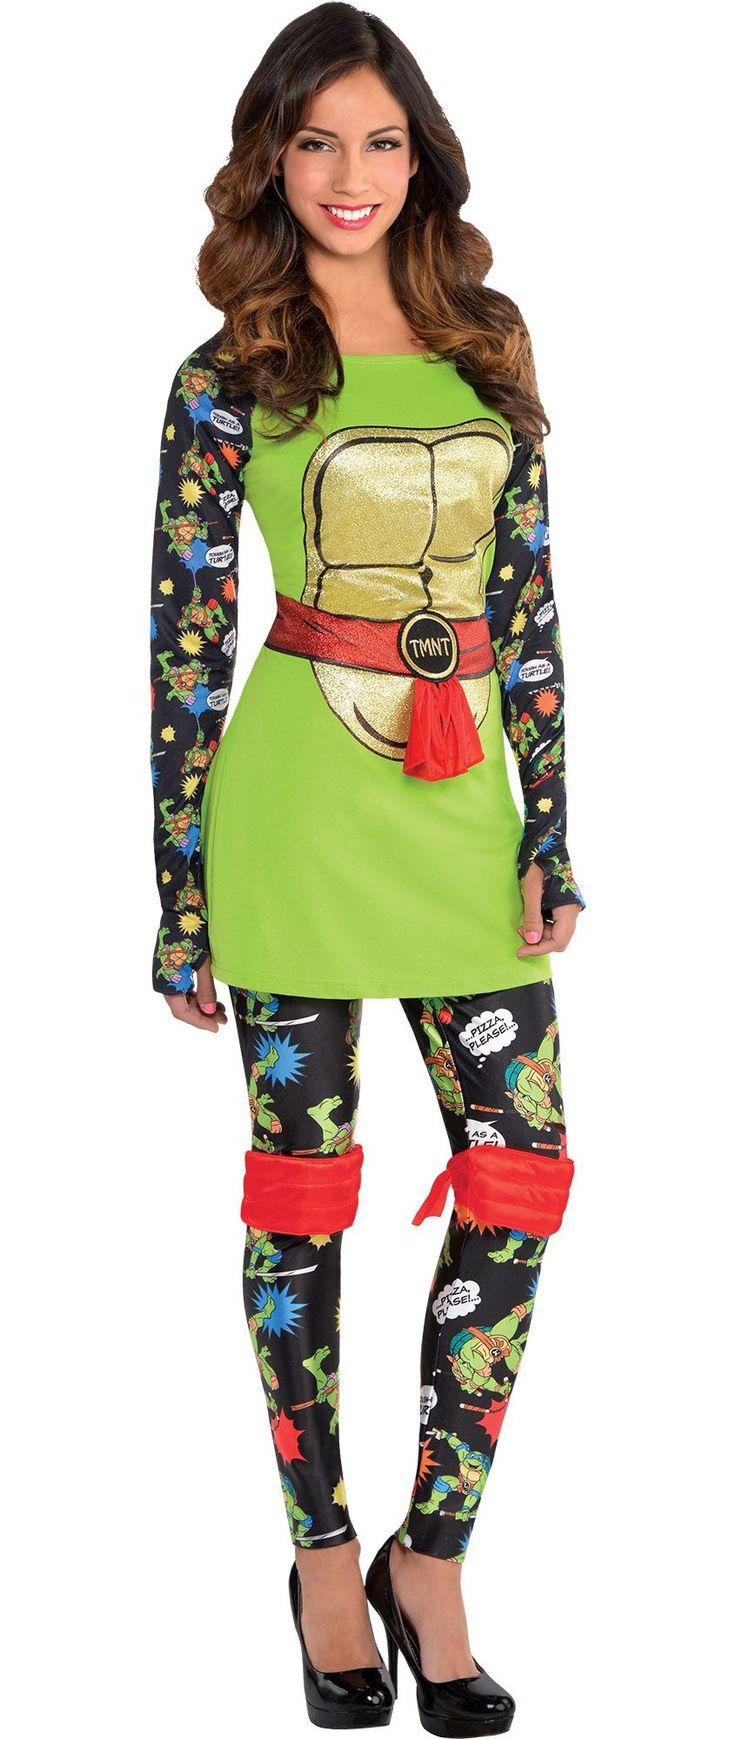 Create Your Own Look Female Teenage Mutant Ninja Turtle